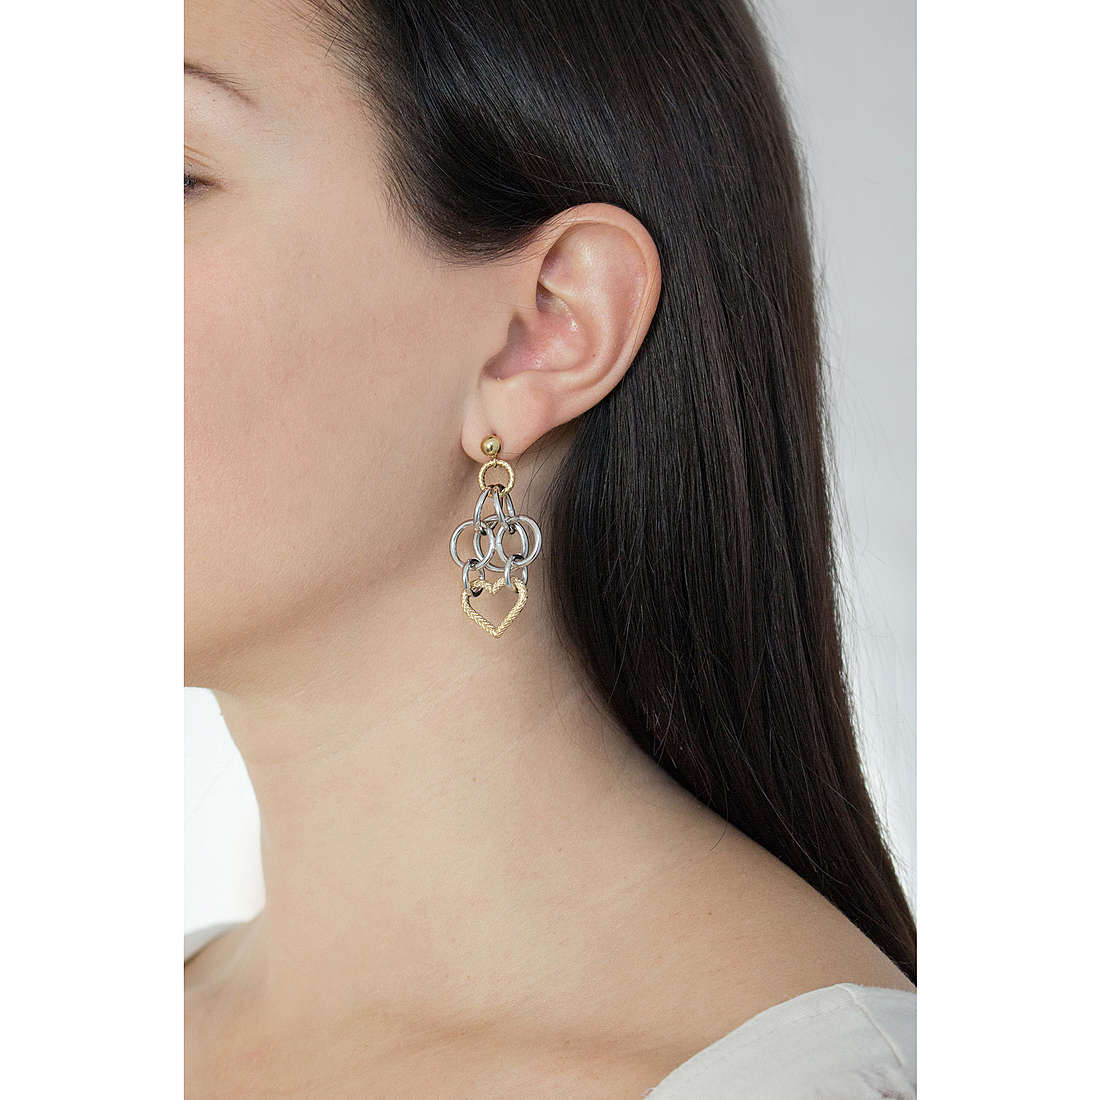 Morellato earrings Essenza woman SAGX06 photo wearing